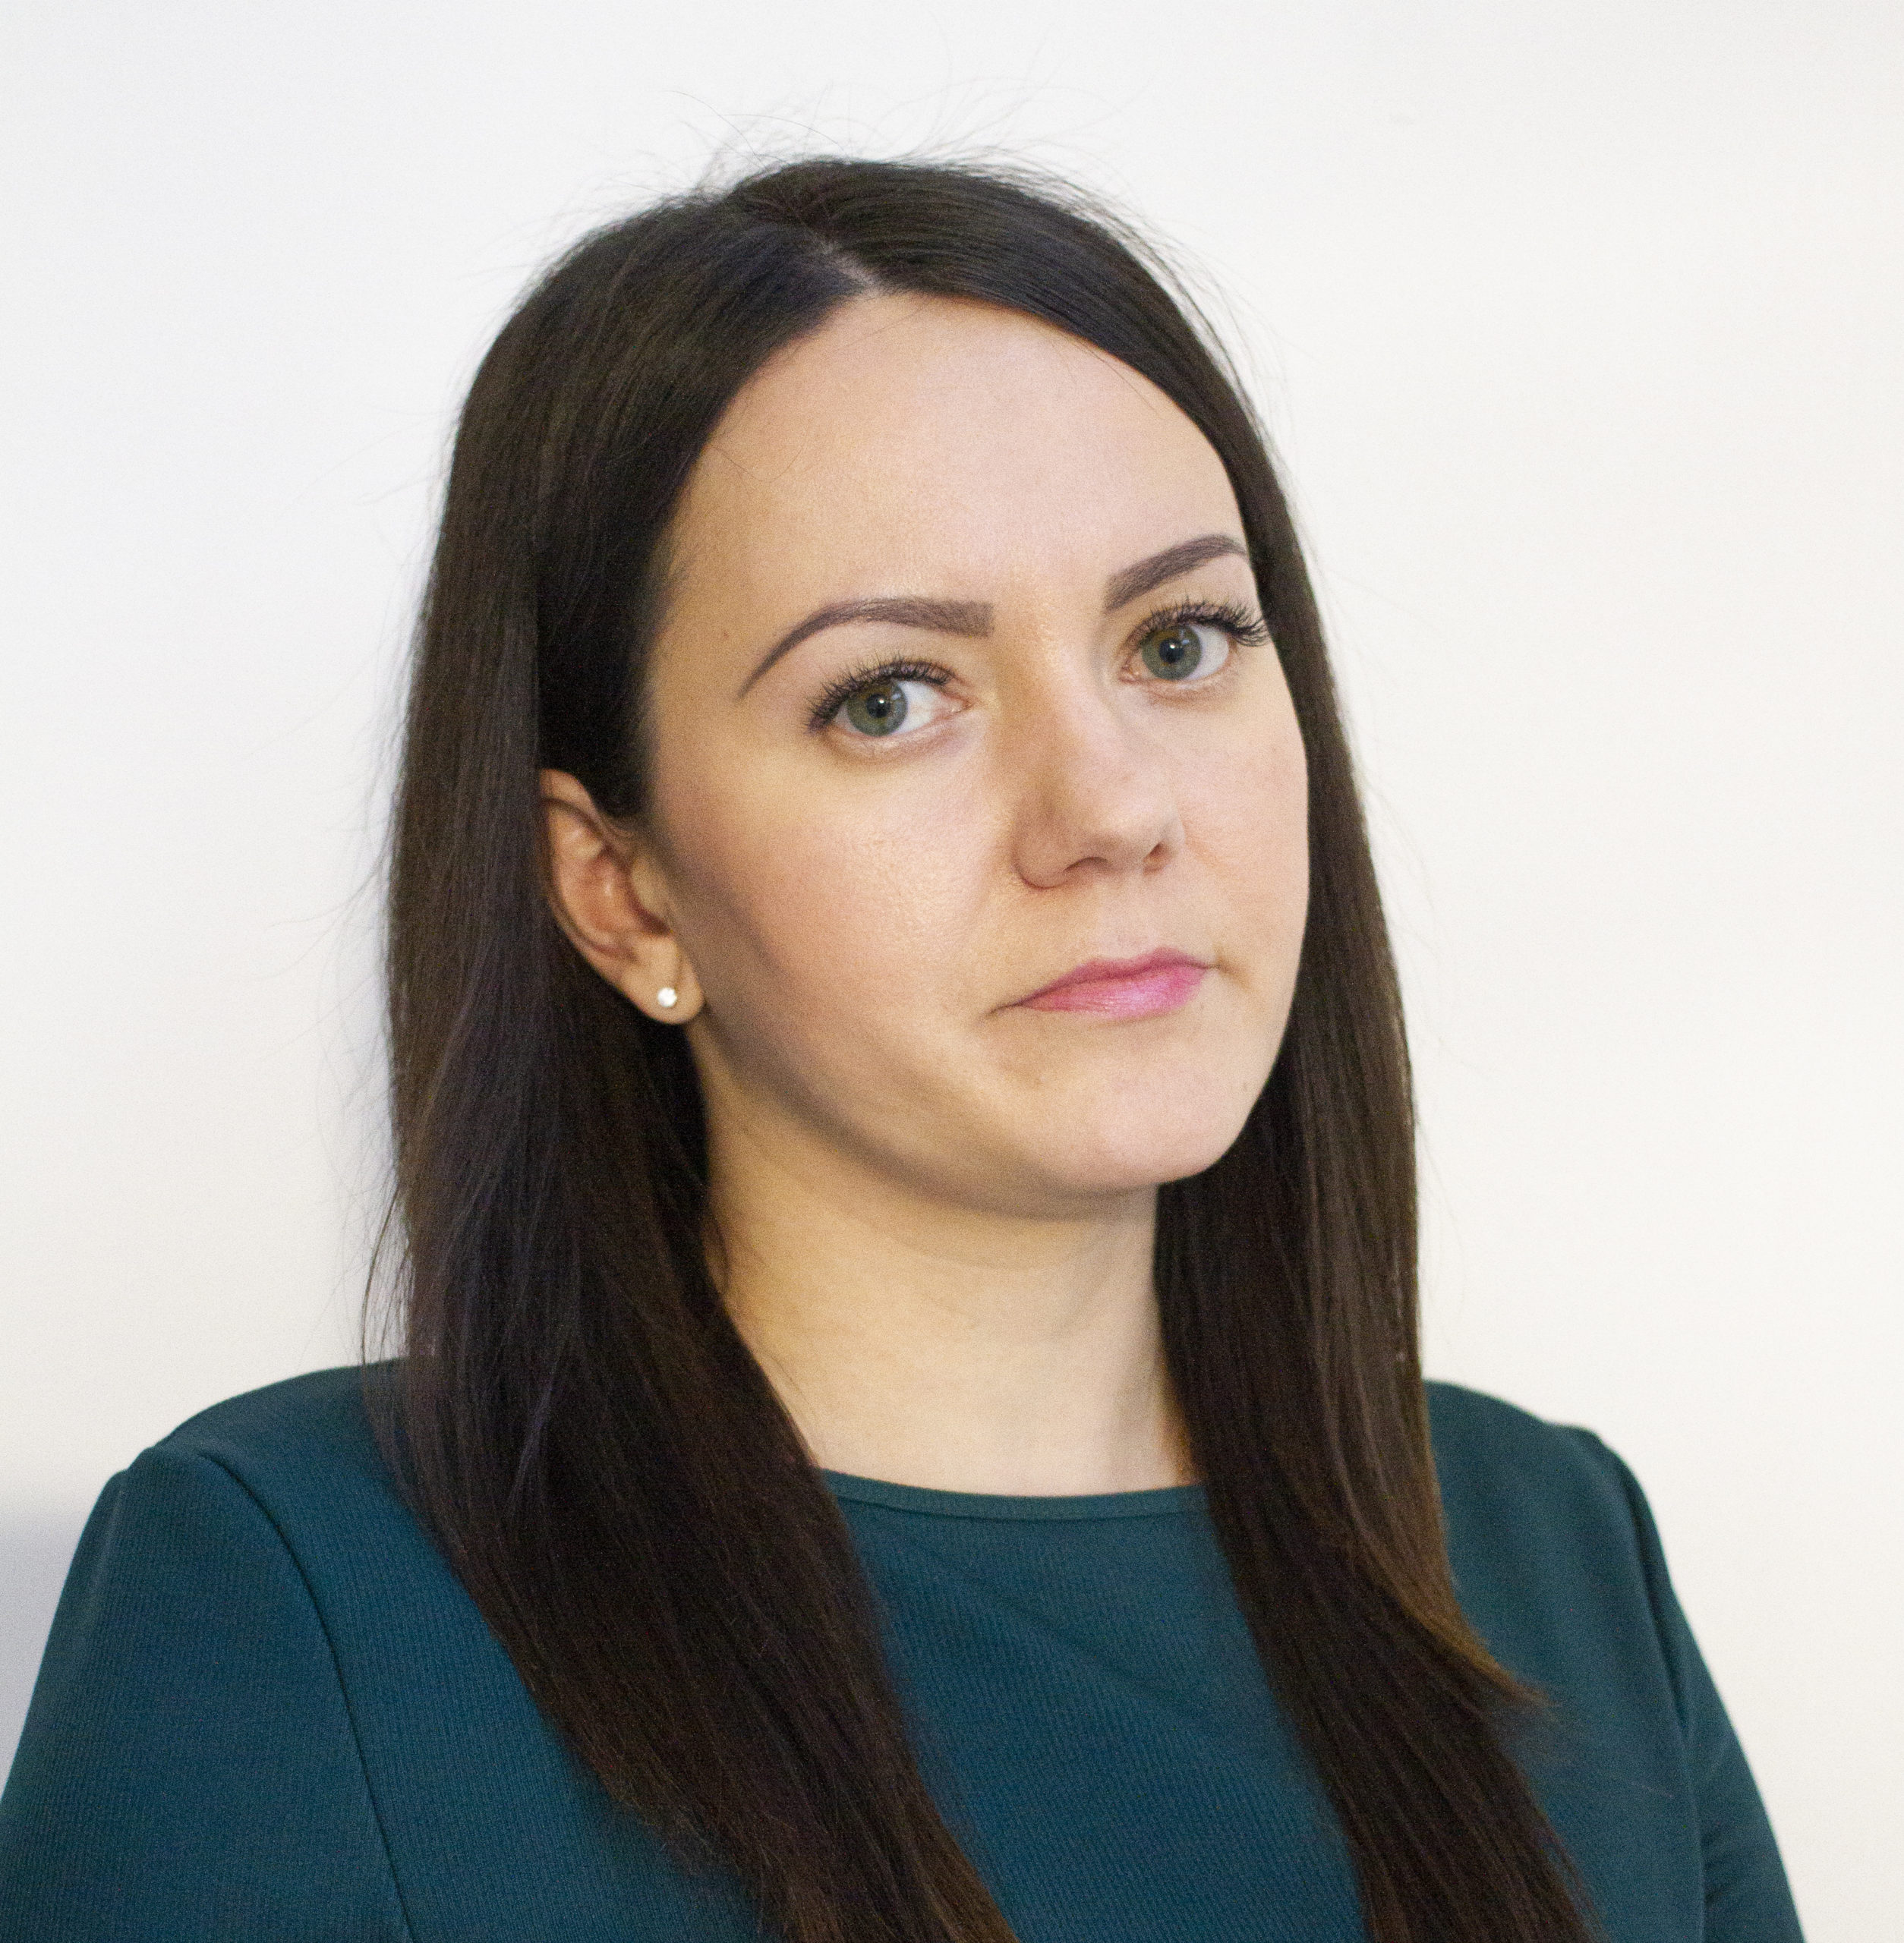 Мальцева Ирина Викторовна